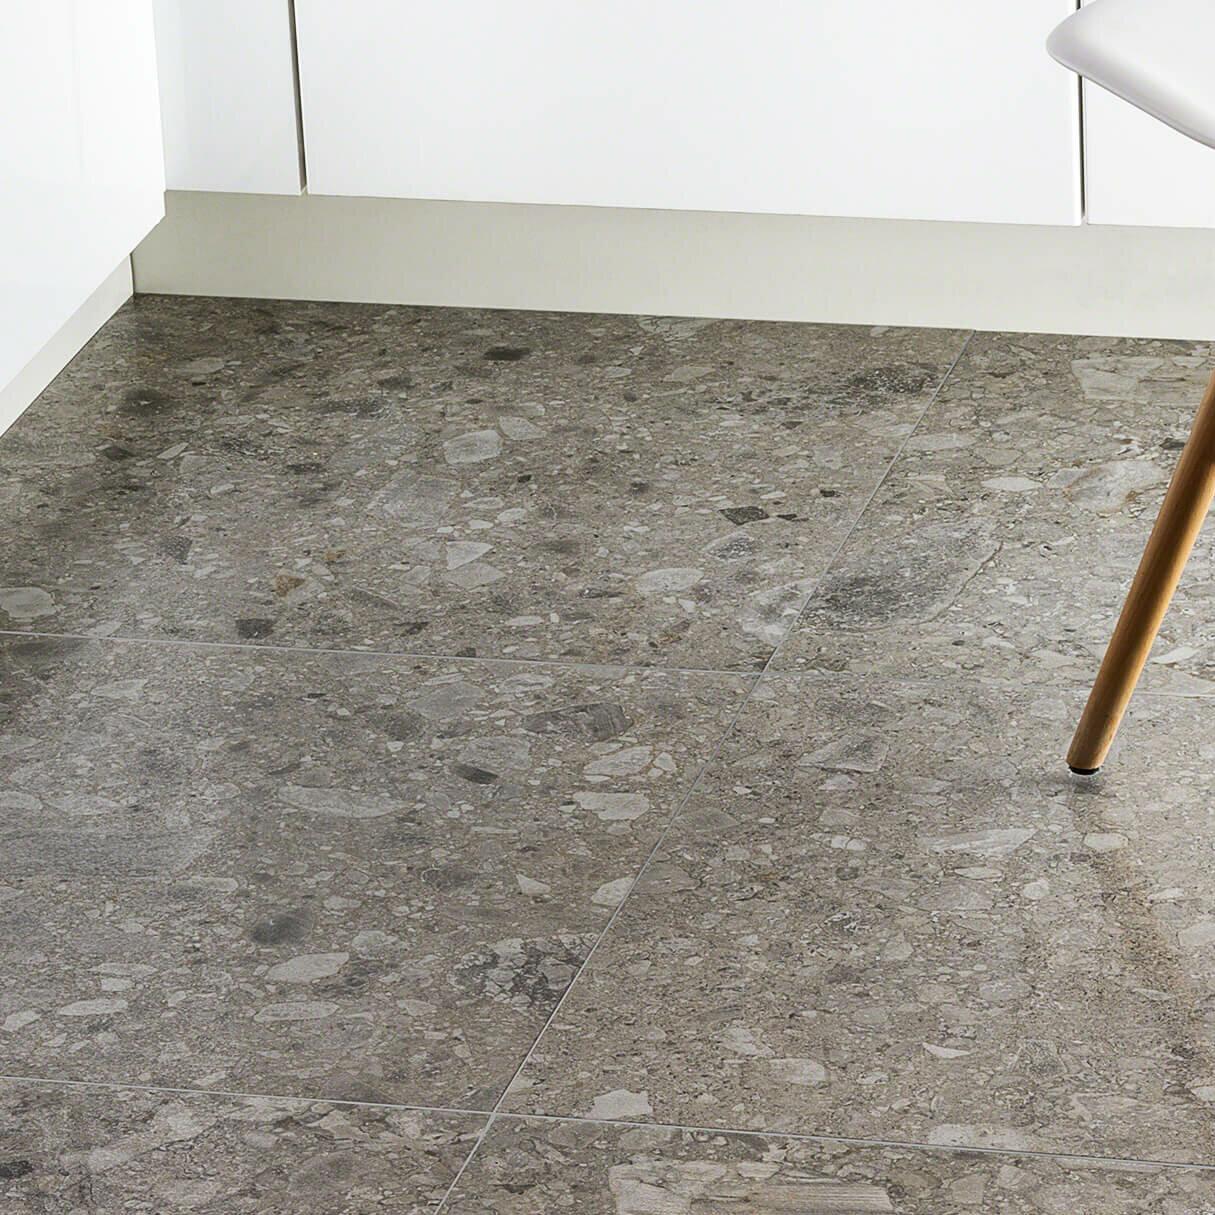 Ivy Hill Tile Rizo 24 X 24 Porcelain Wall Floor Tile Reviews Wayfair